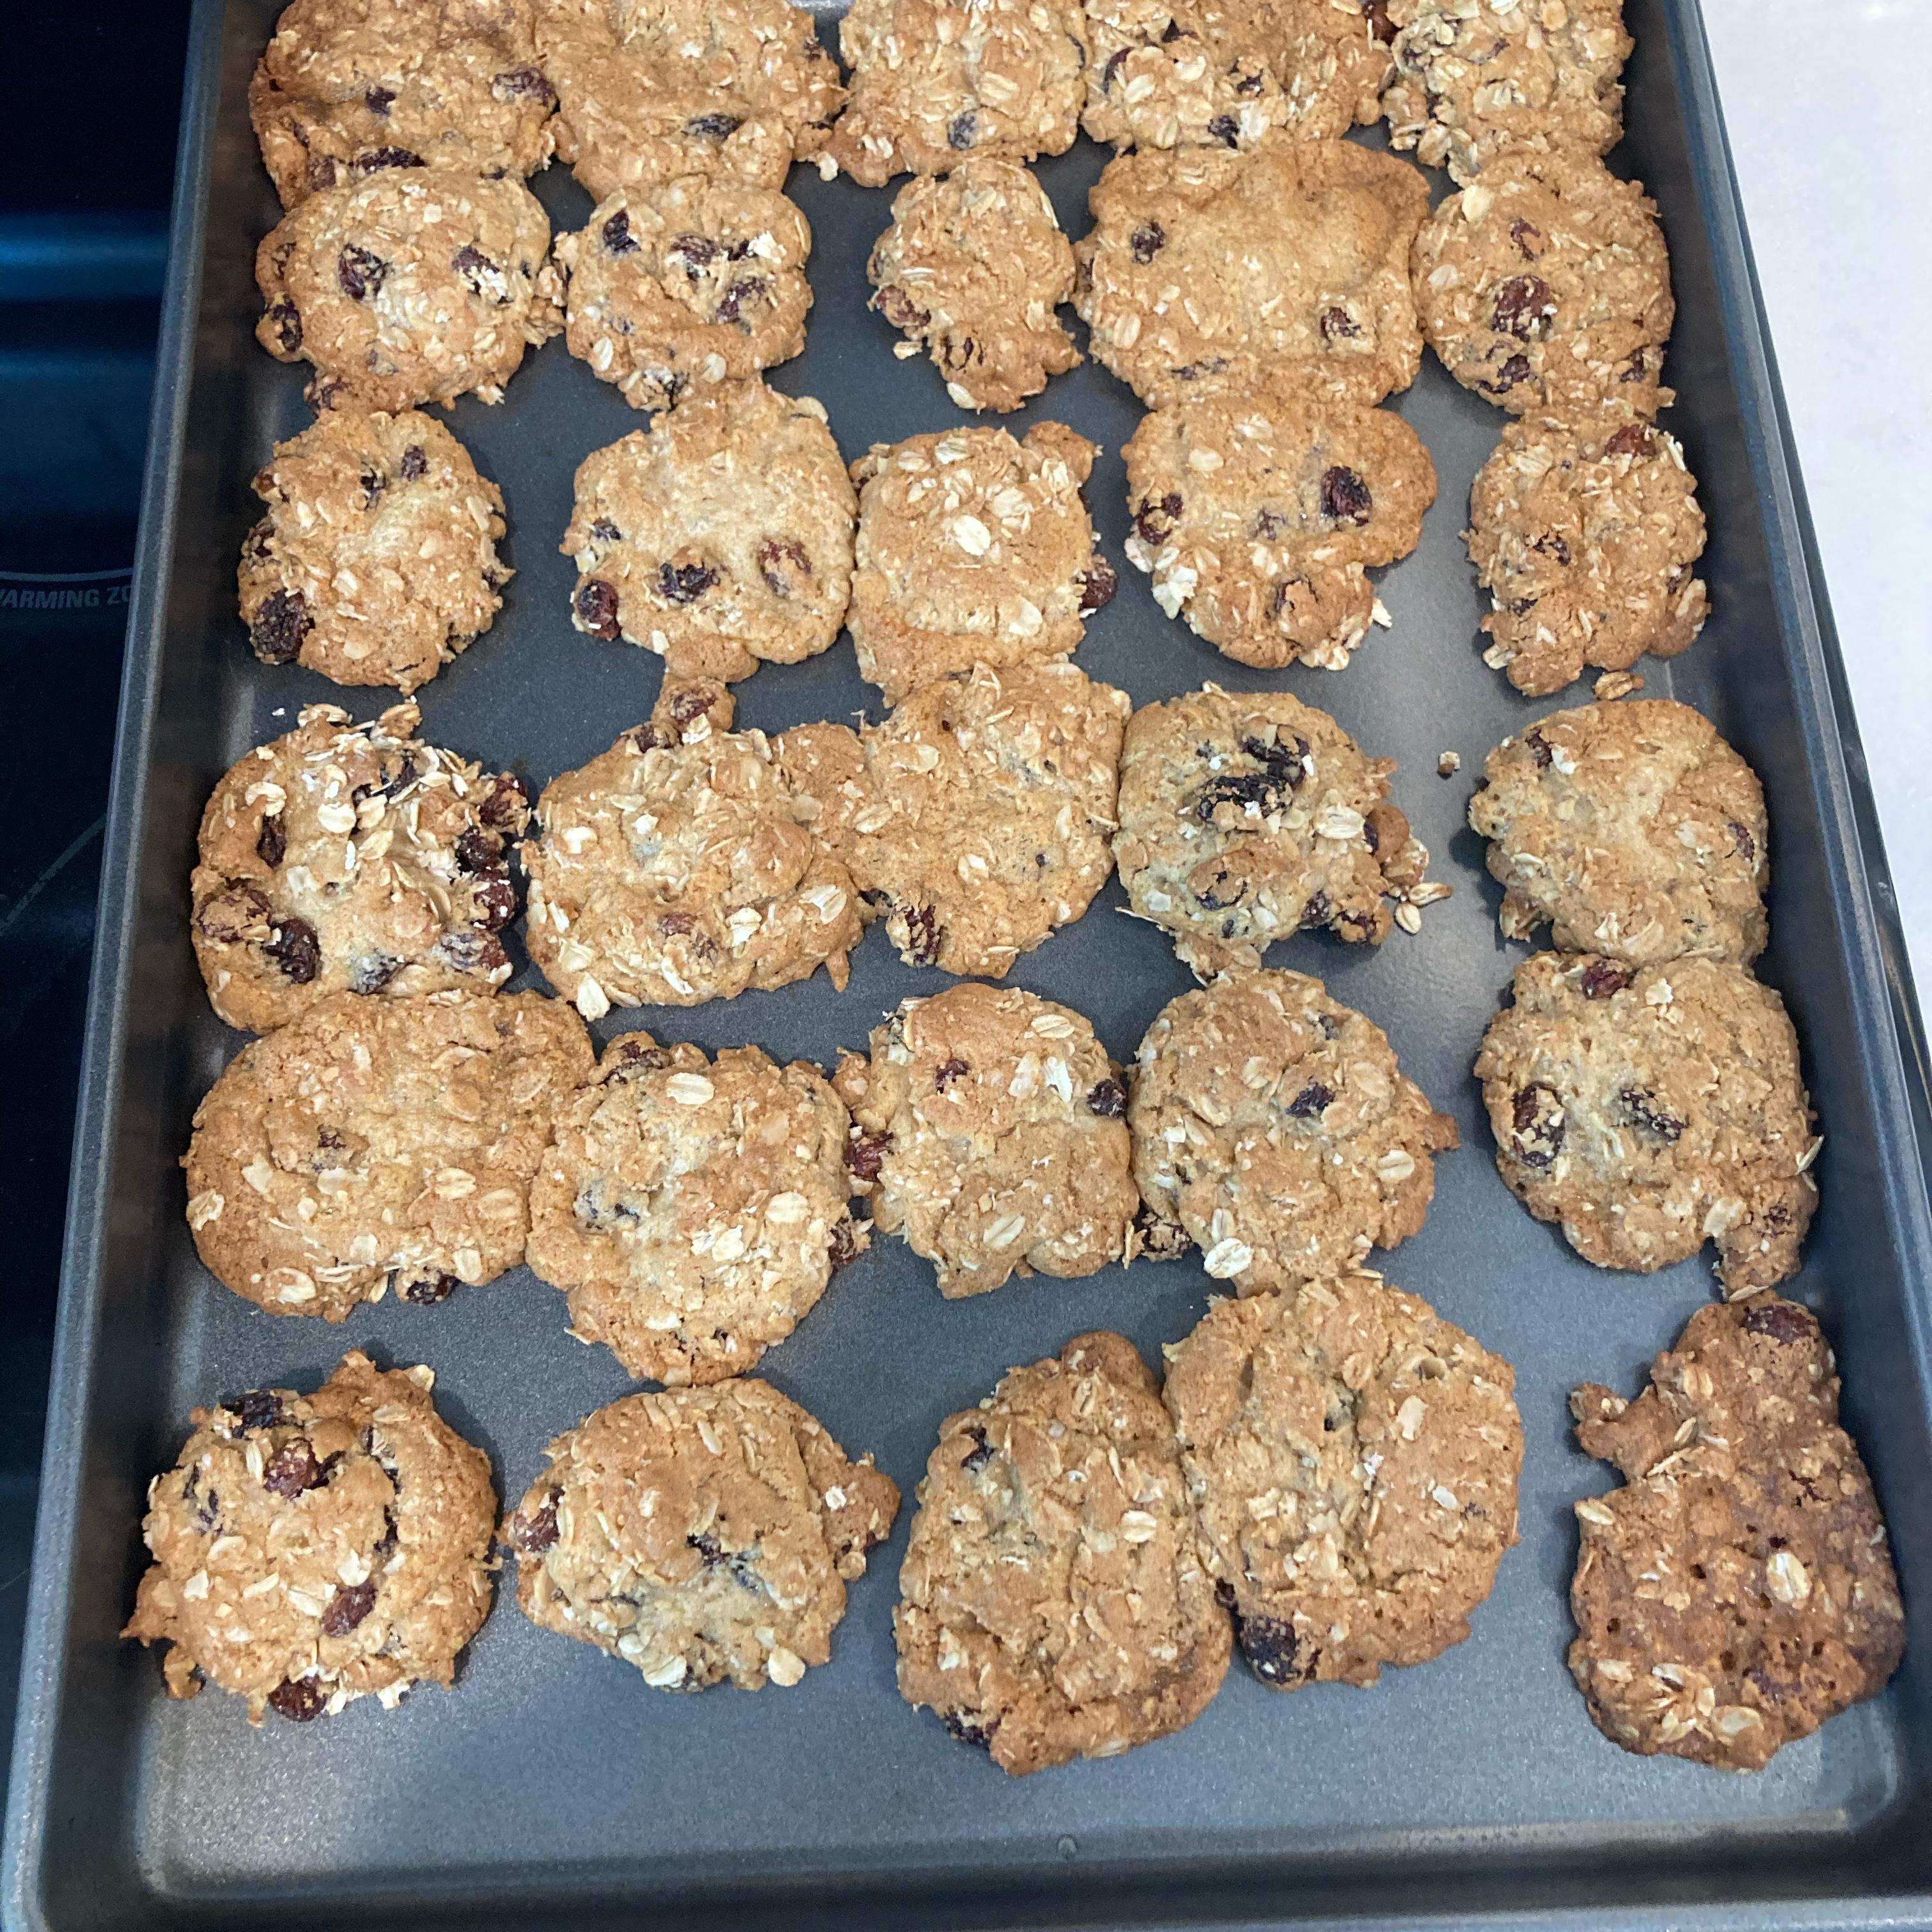 Oatmeal Raisin Cookies VII marvelmelodies